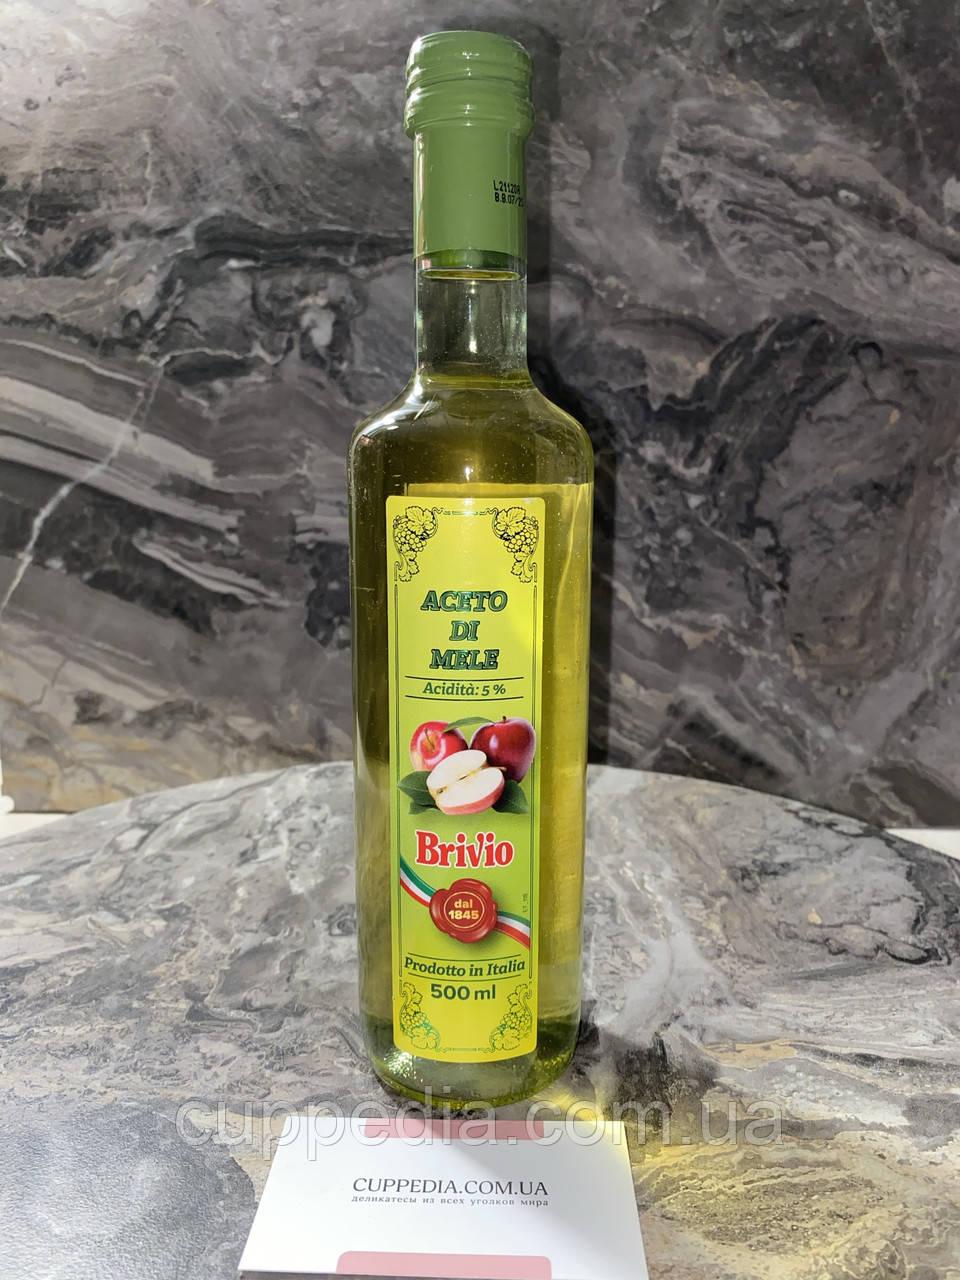 Яблочный уксус Brivio Aceto di mele 500 мл